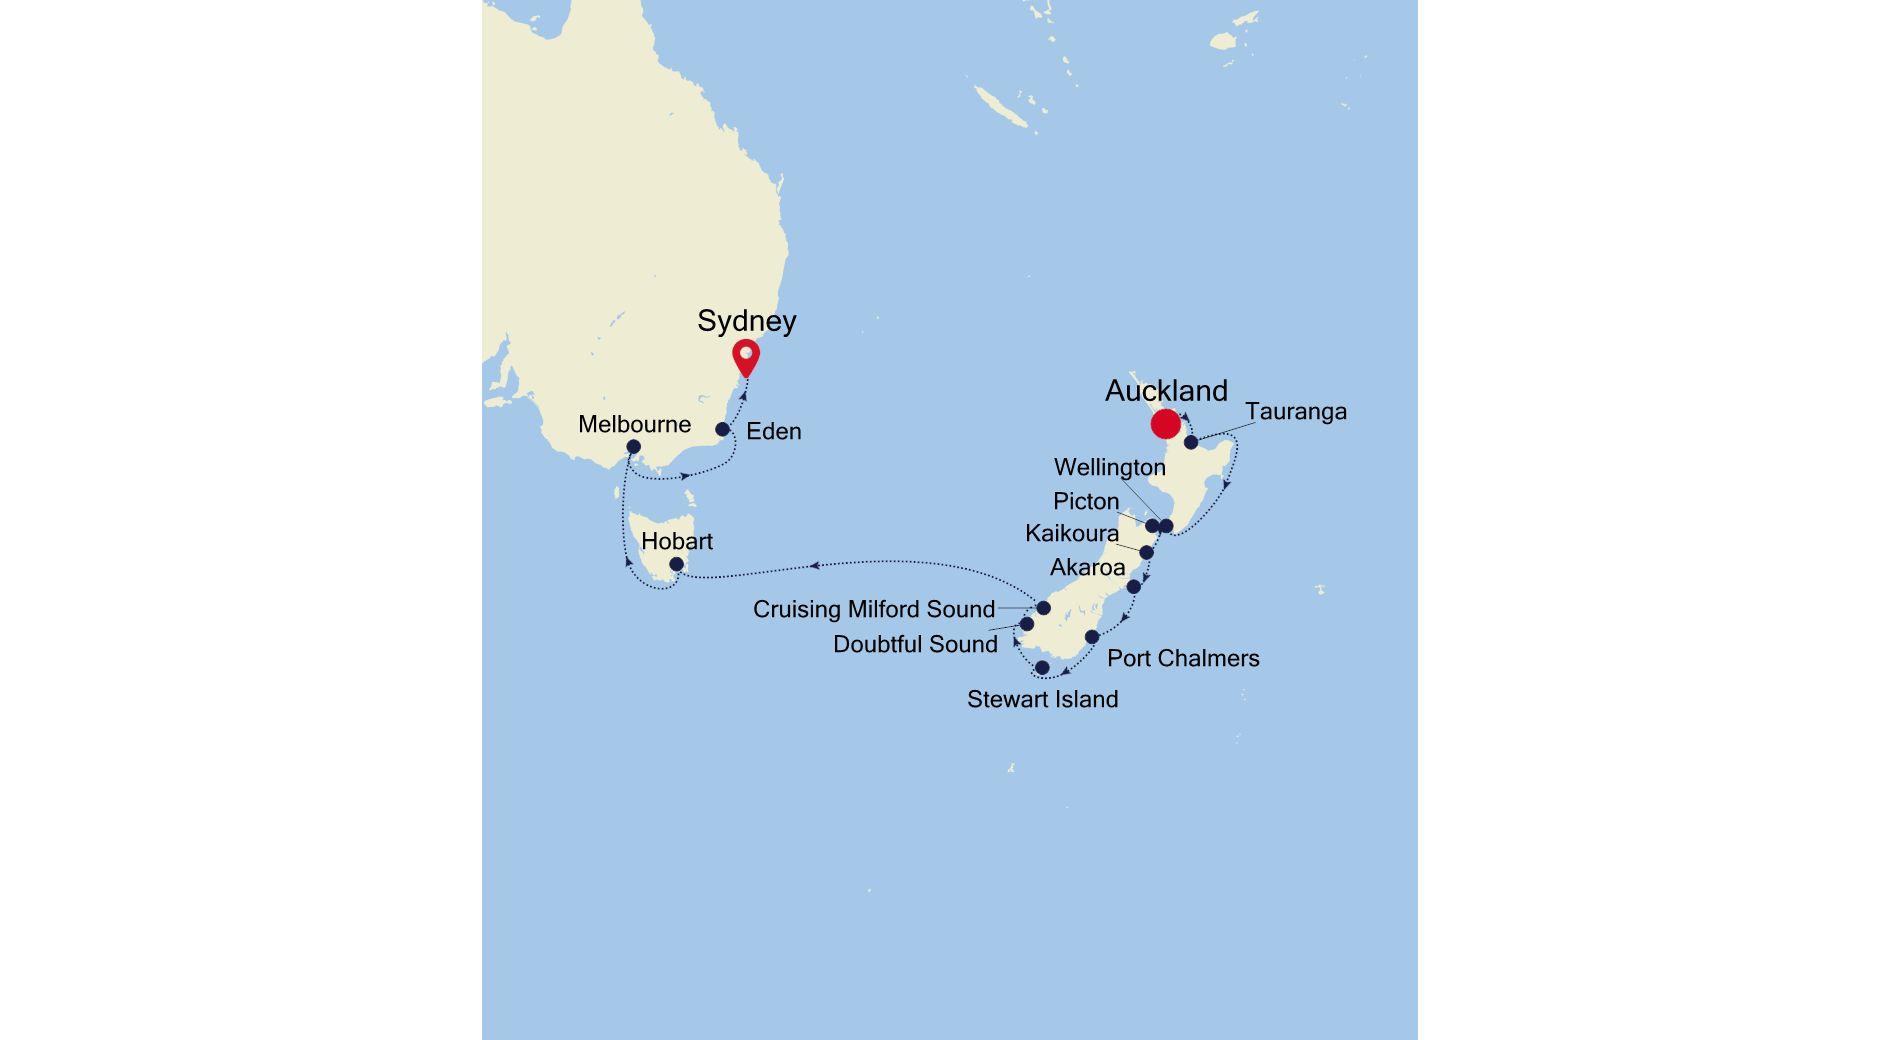 SM210202017 - Auckland nach Sydney